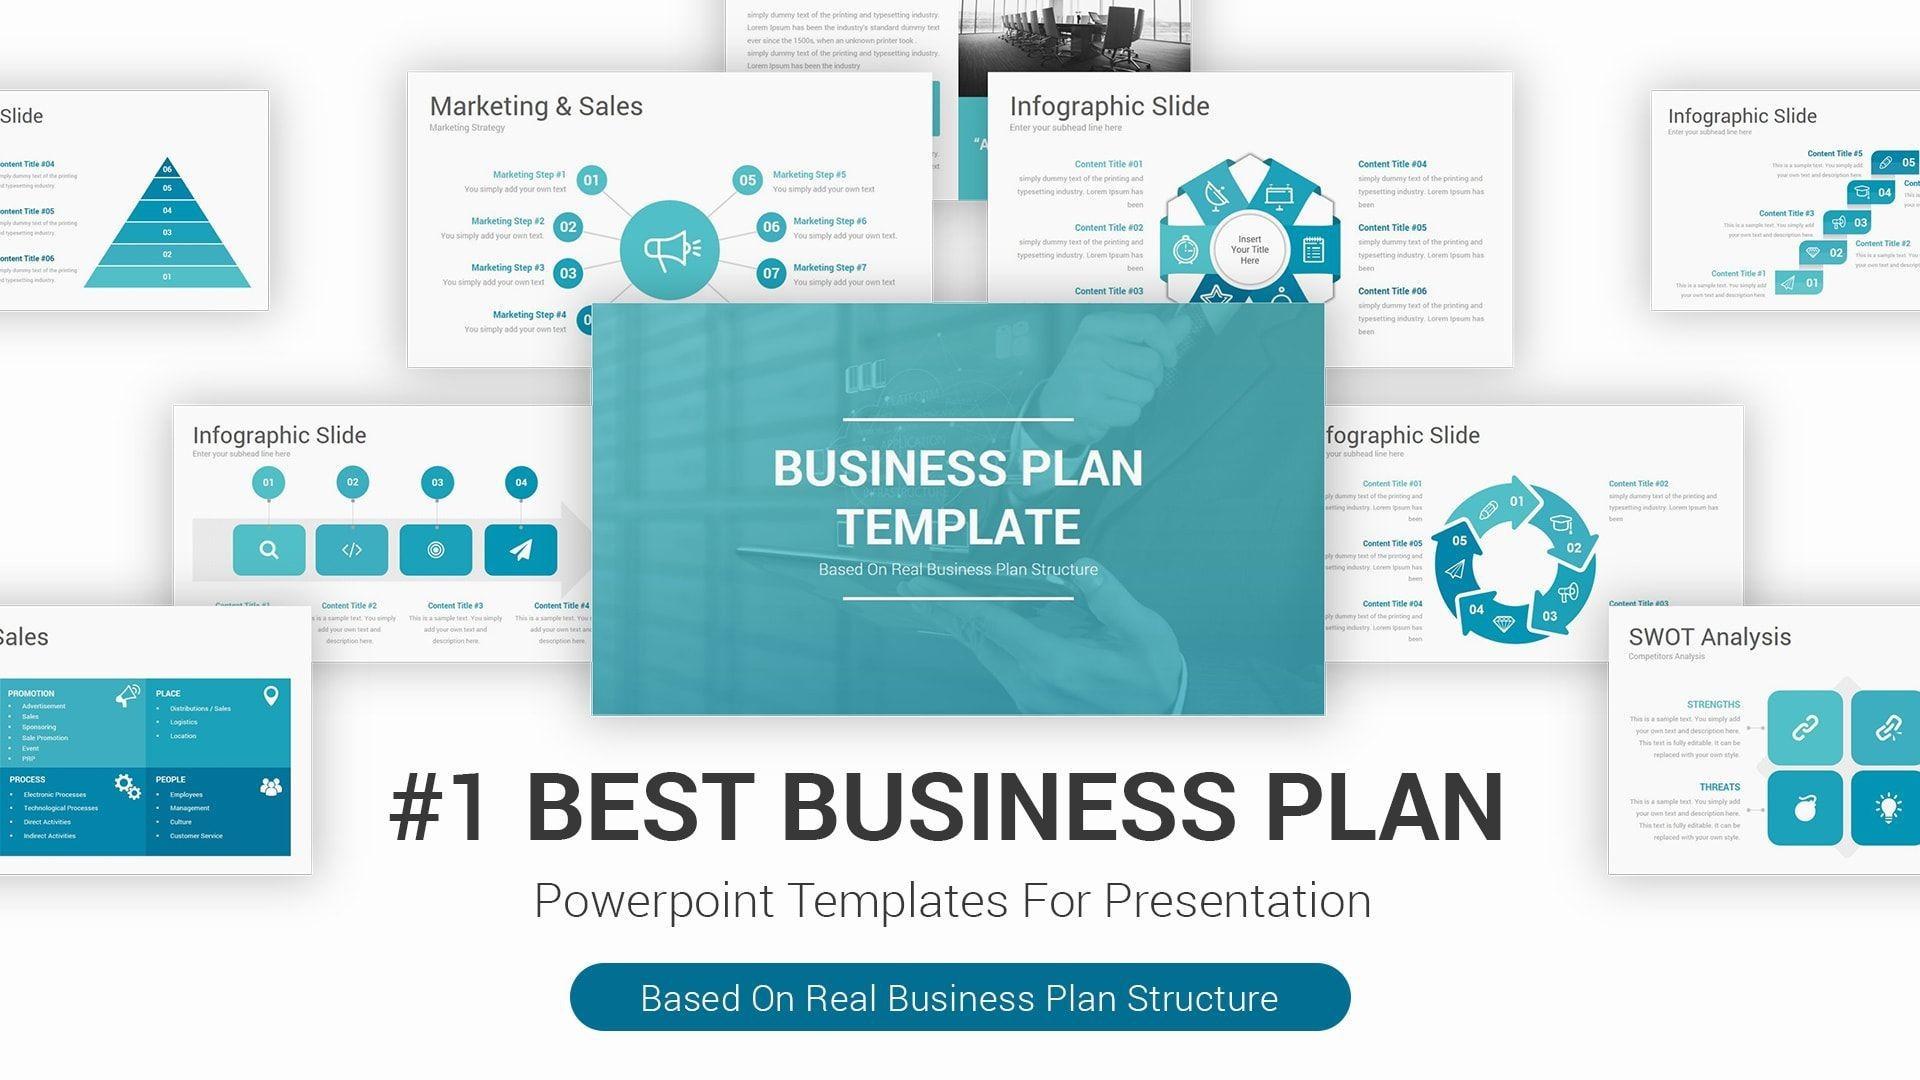 000 Impressive Free Download Busines Proposal Template Ppt Highest Clarity  Best Plan Sample Plan.ppt 20201920